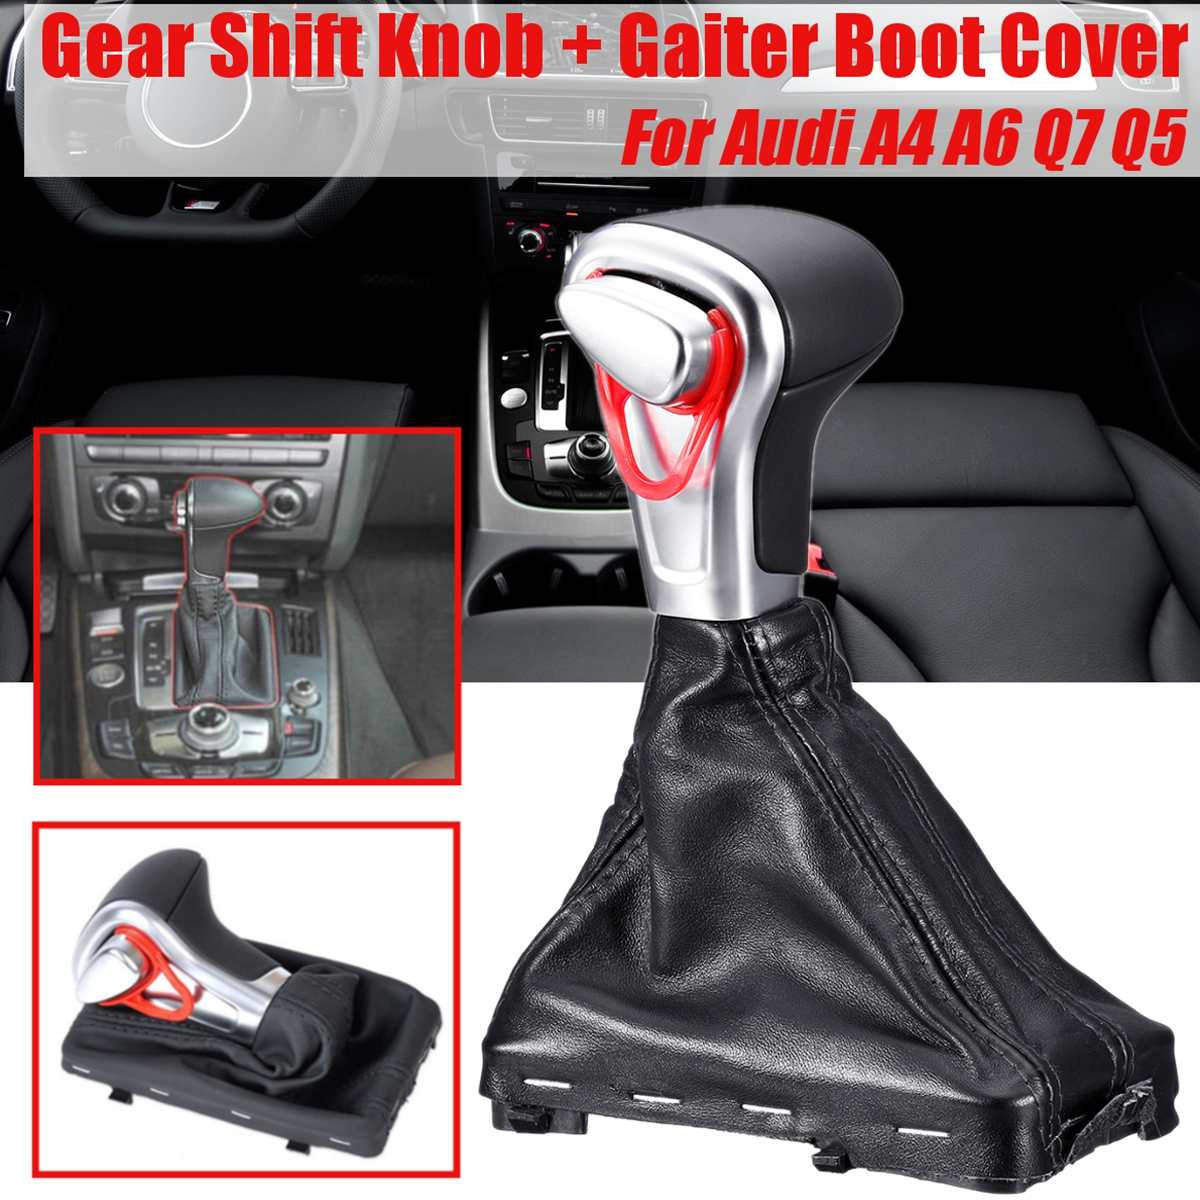 Gaiter Boot Cover DSG S-Tronic for B8 A4 A5 Q5 2009-2016 8KD 713 139B AOE Shift Knob Gaiter Boot,Gear Shift Stick Knob